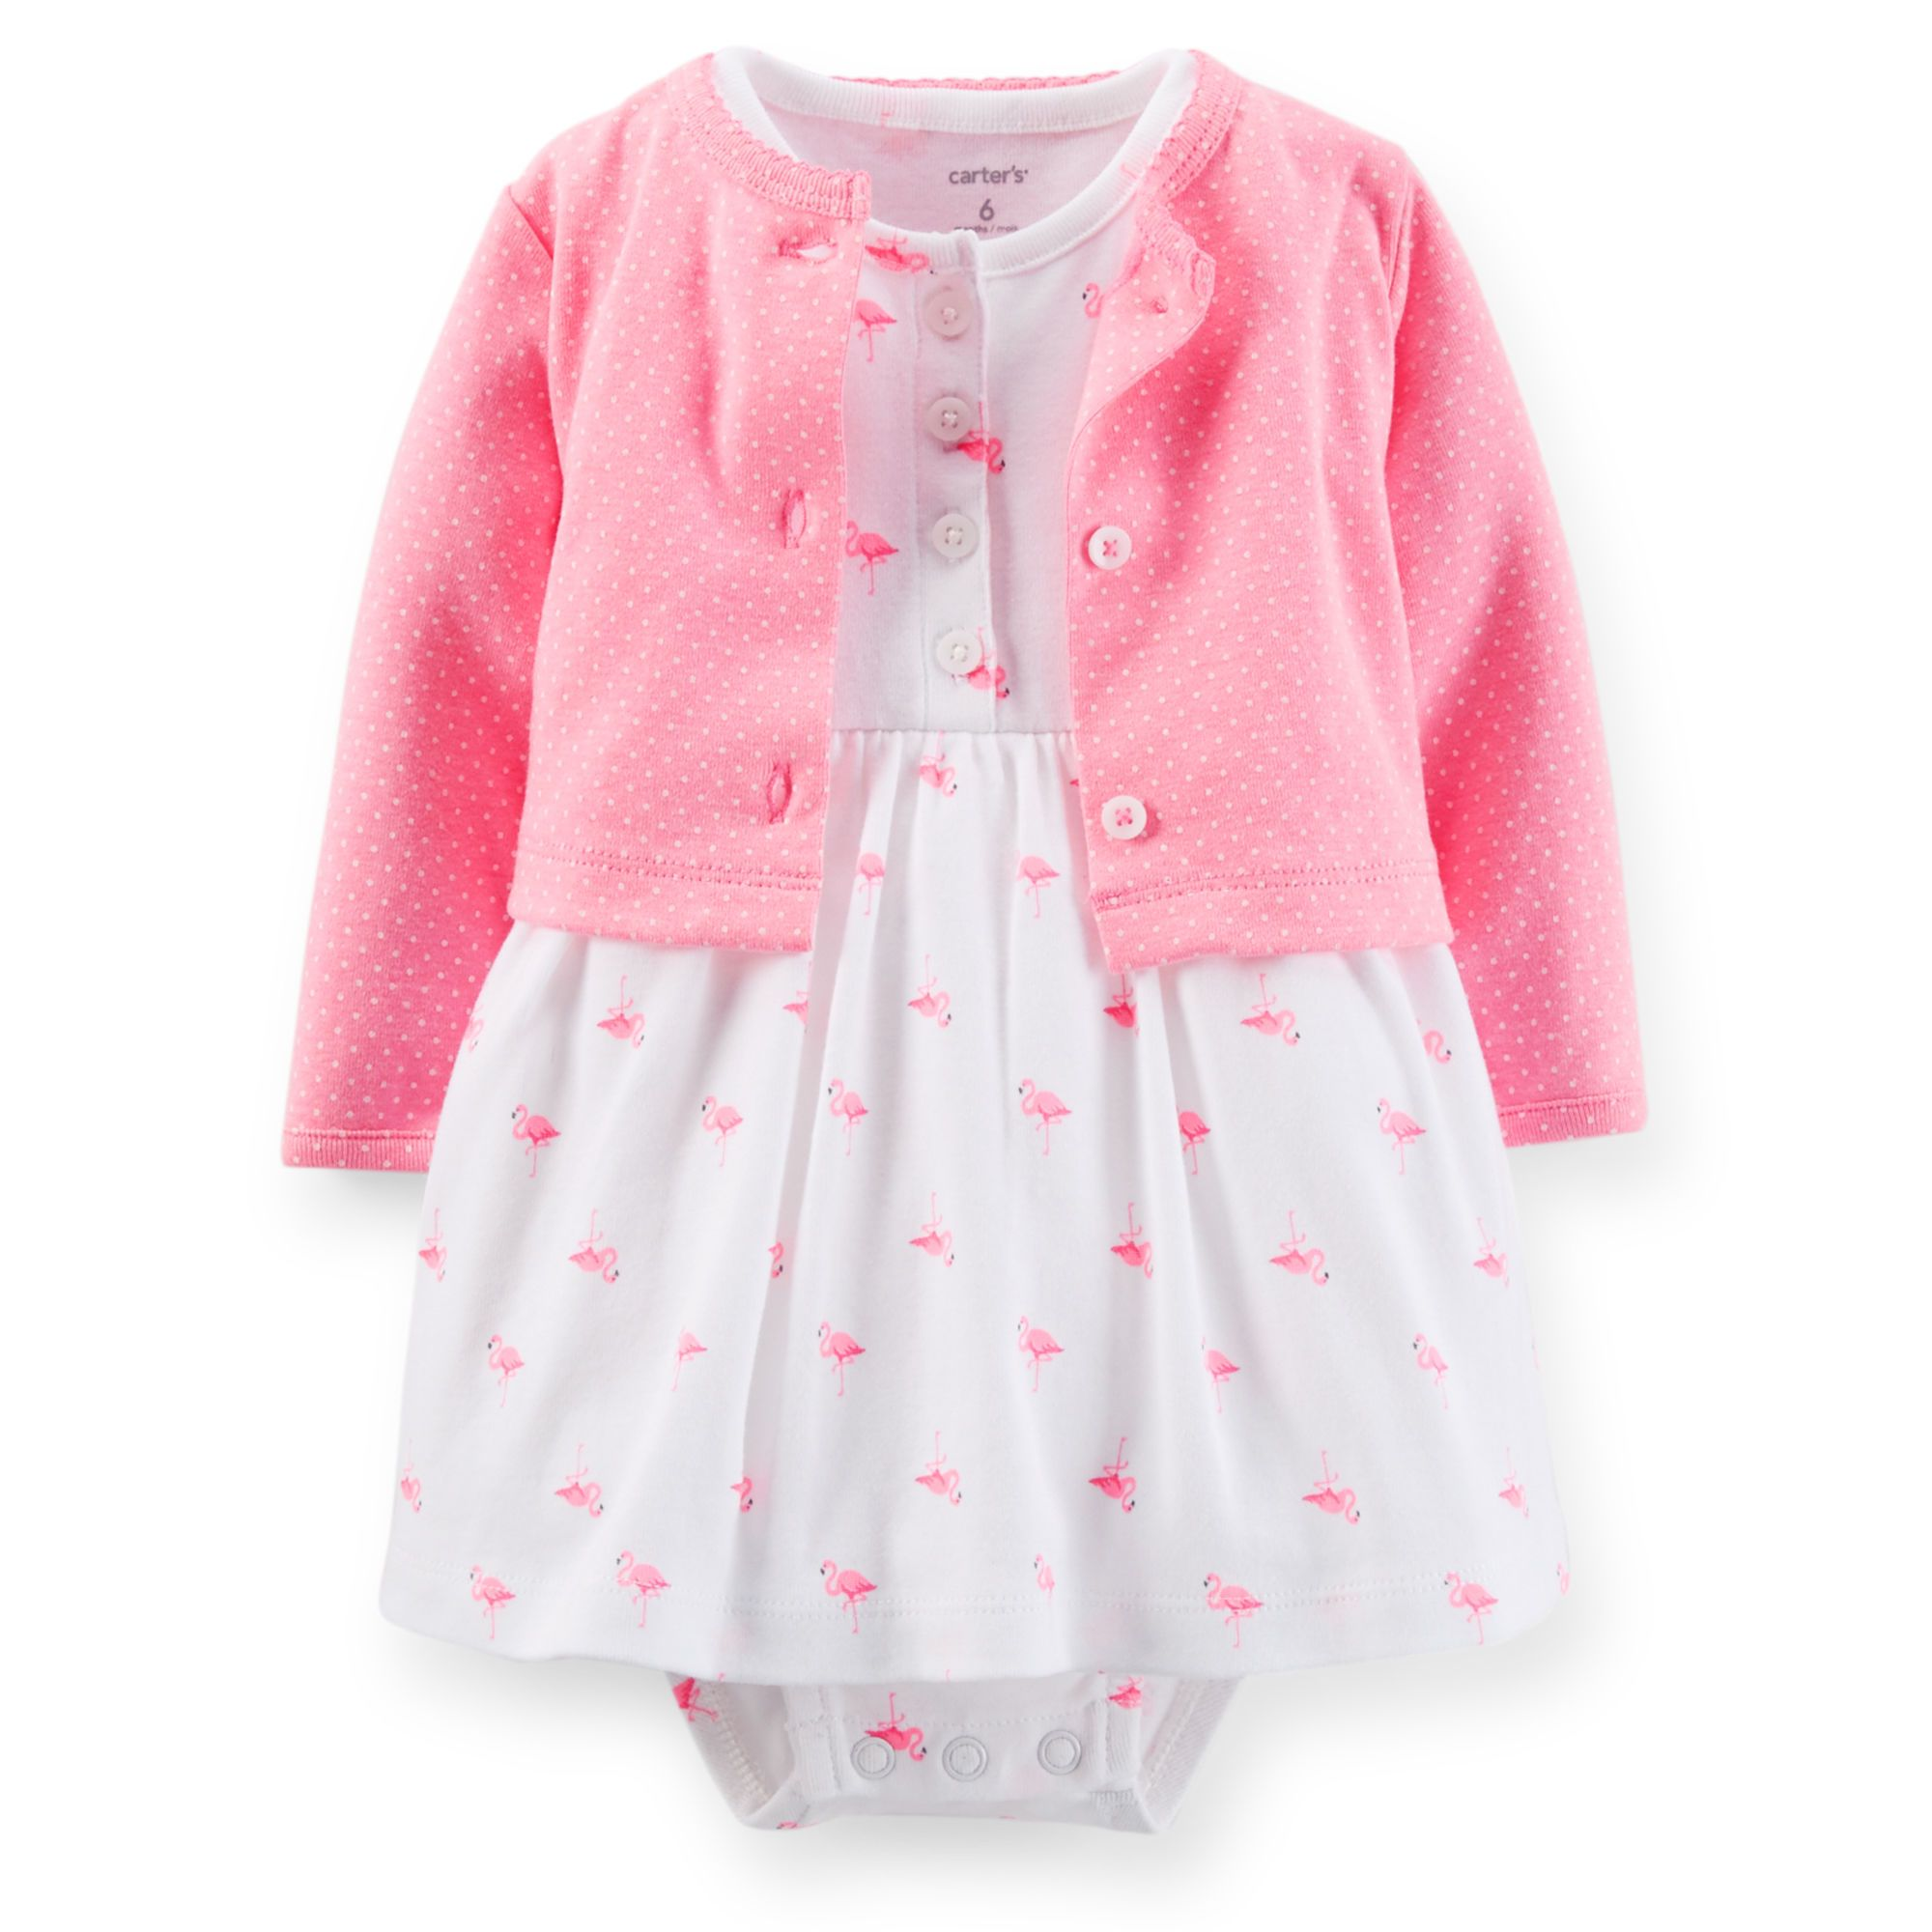 4013a69c9 2-Piece Dress & Cardigan Set   Babies.   Baby outfits newborn ...